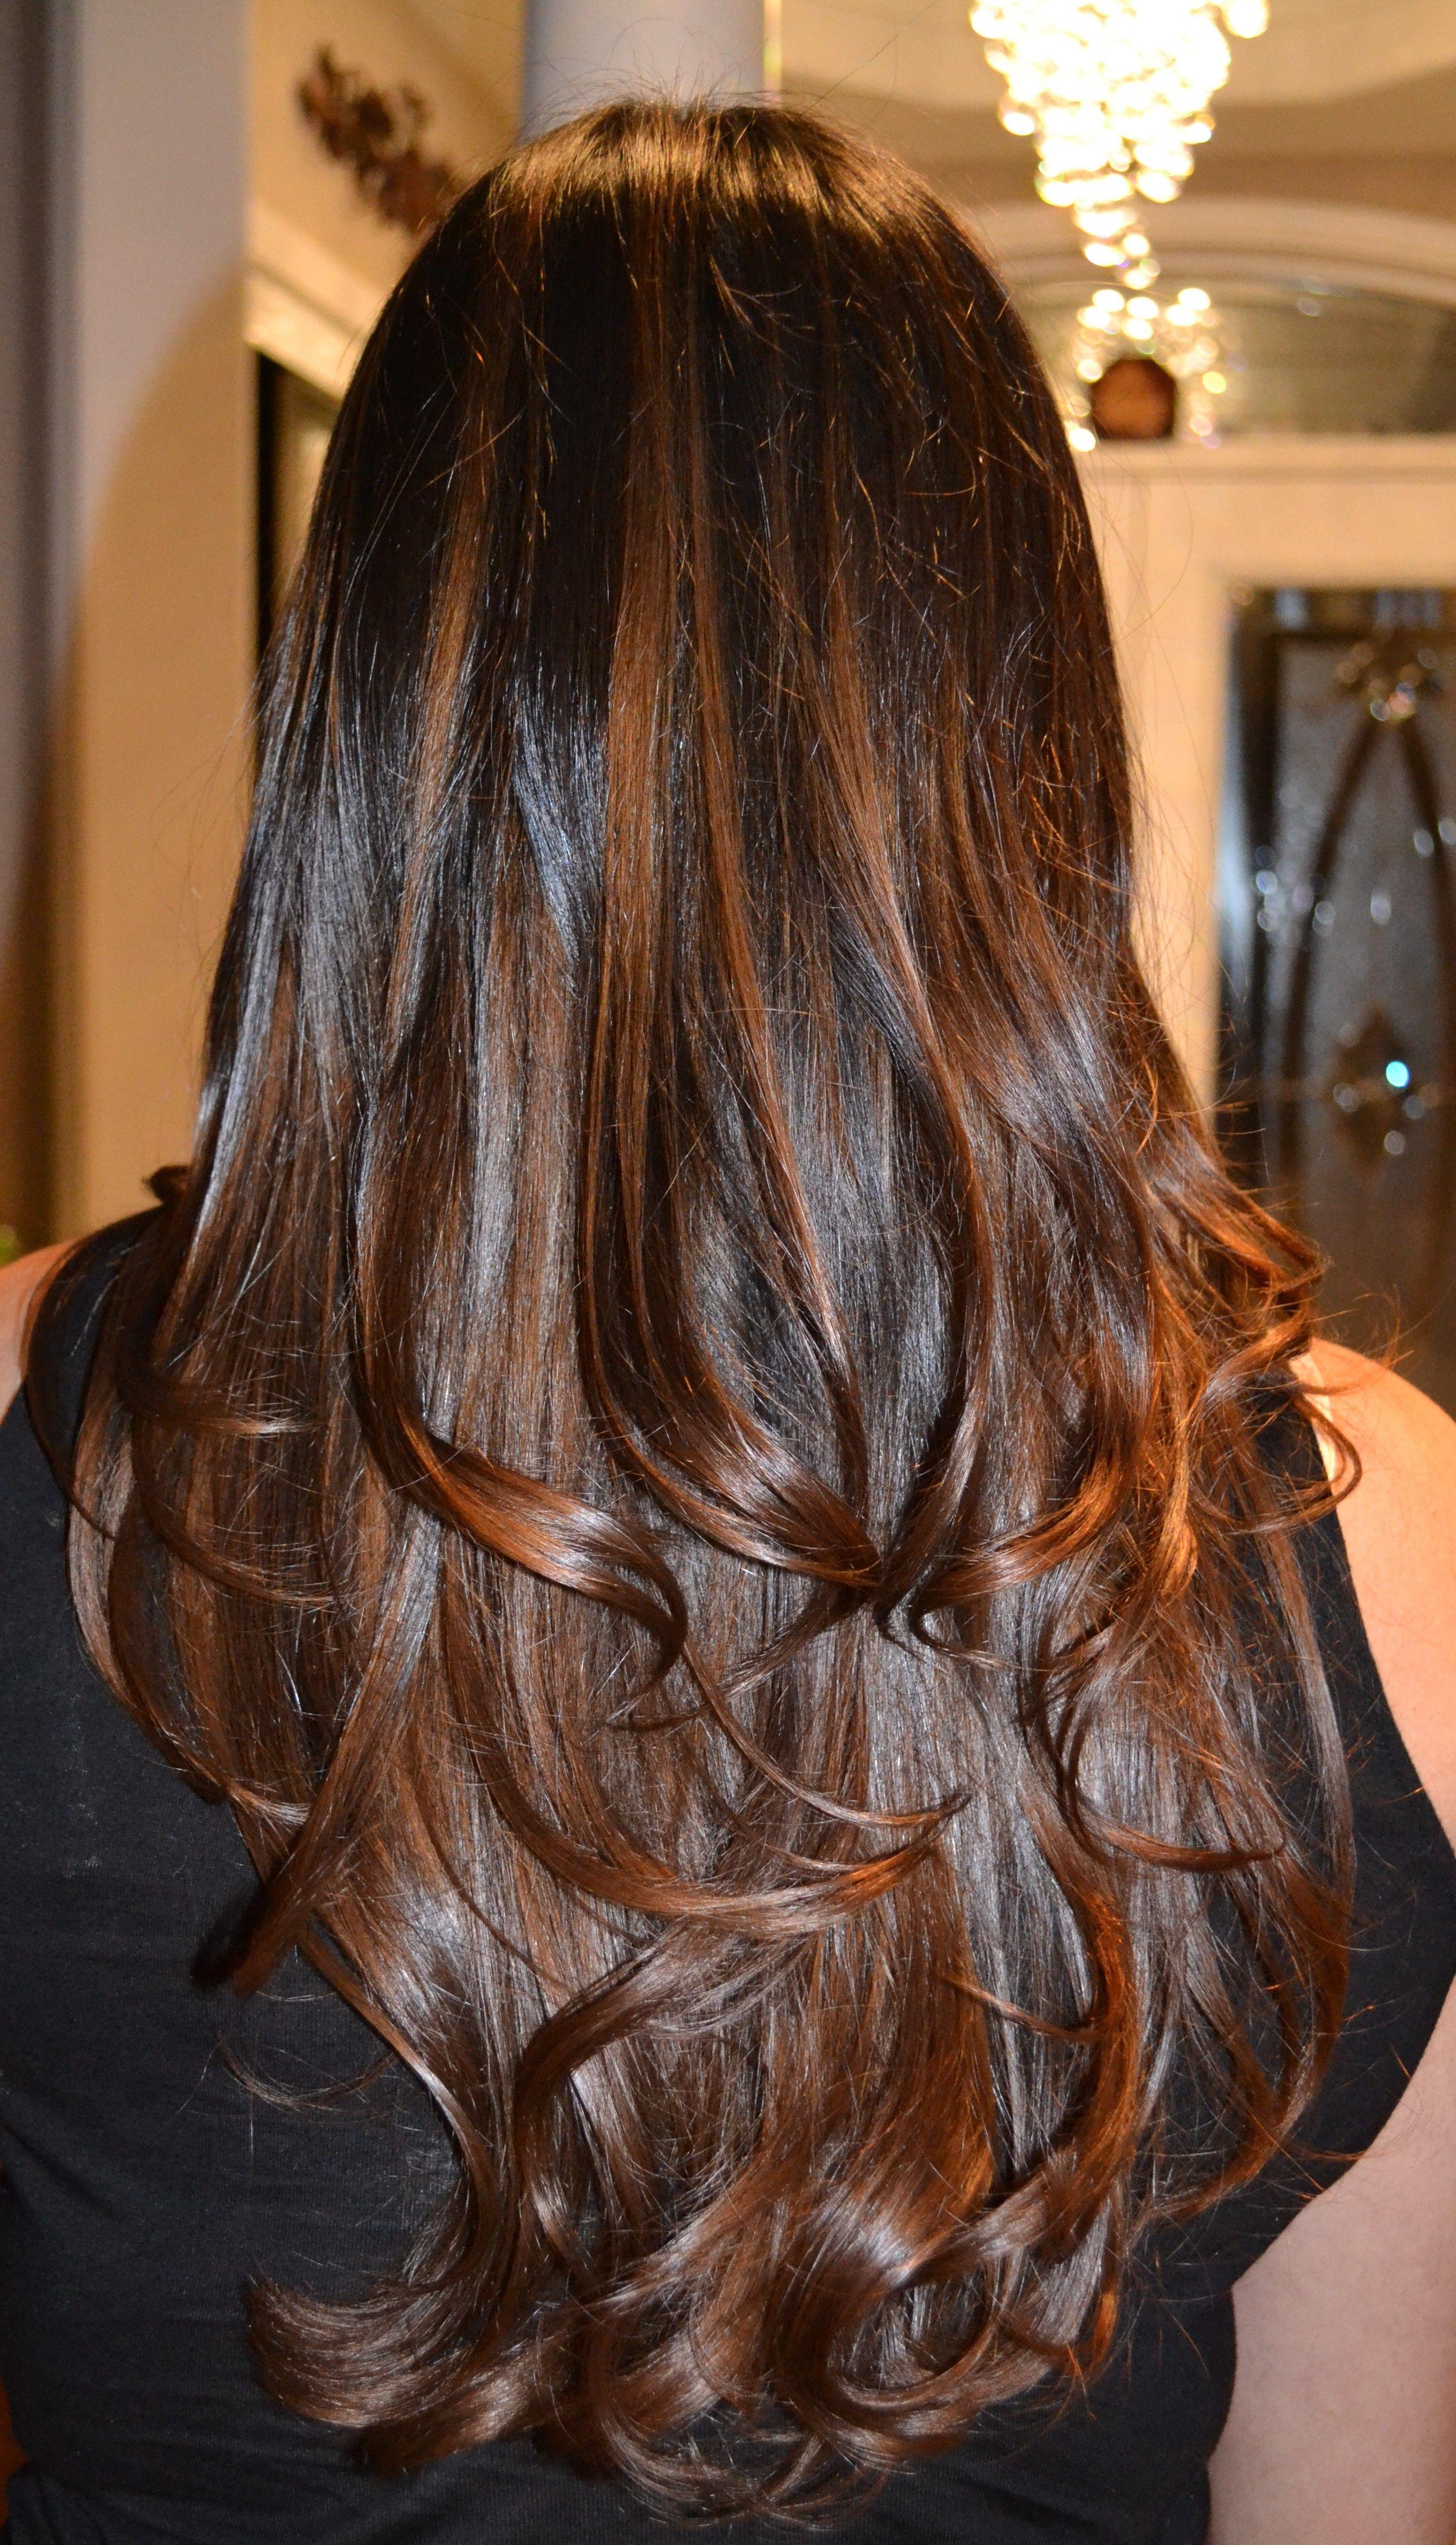 Highlights - Natural Brown / Caramel on dark brown / black ...